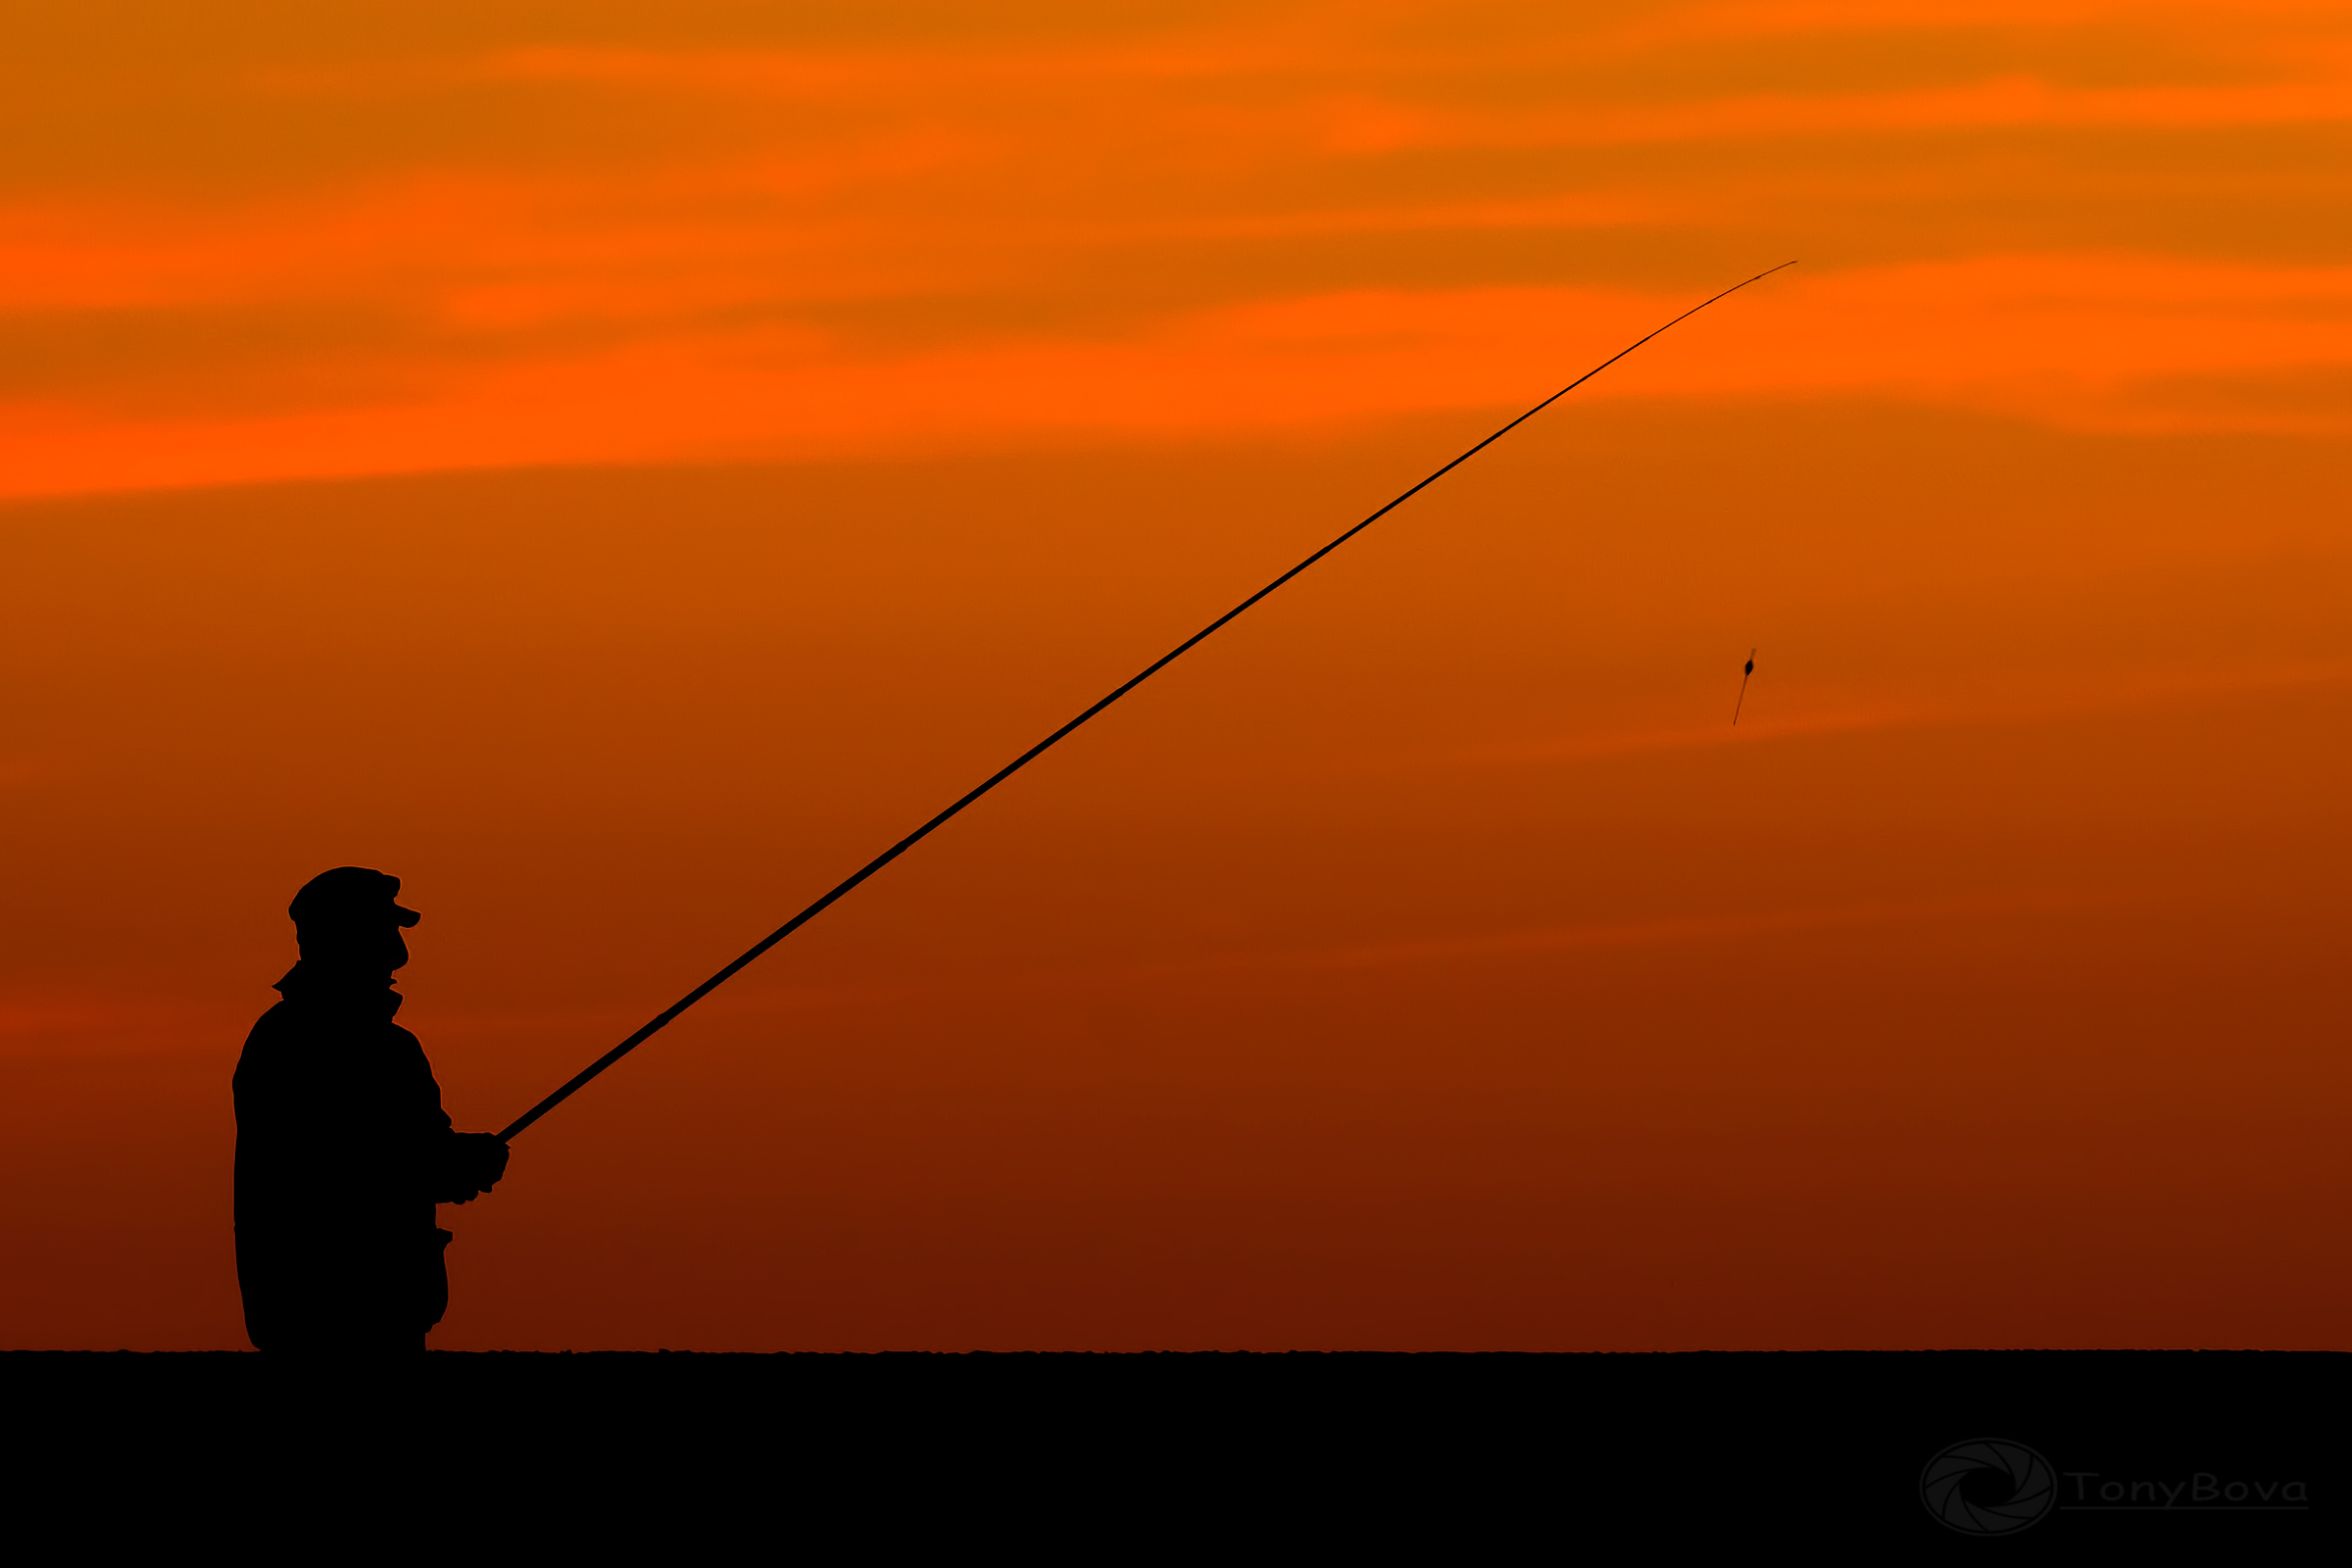 The lone fisherman ......